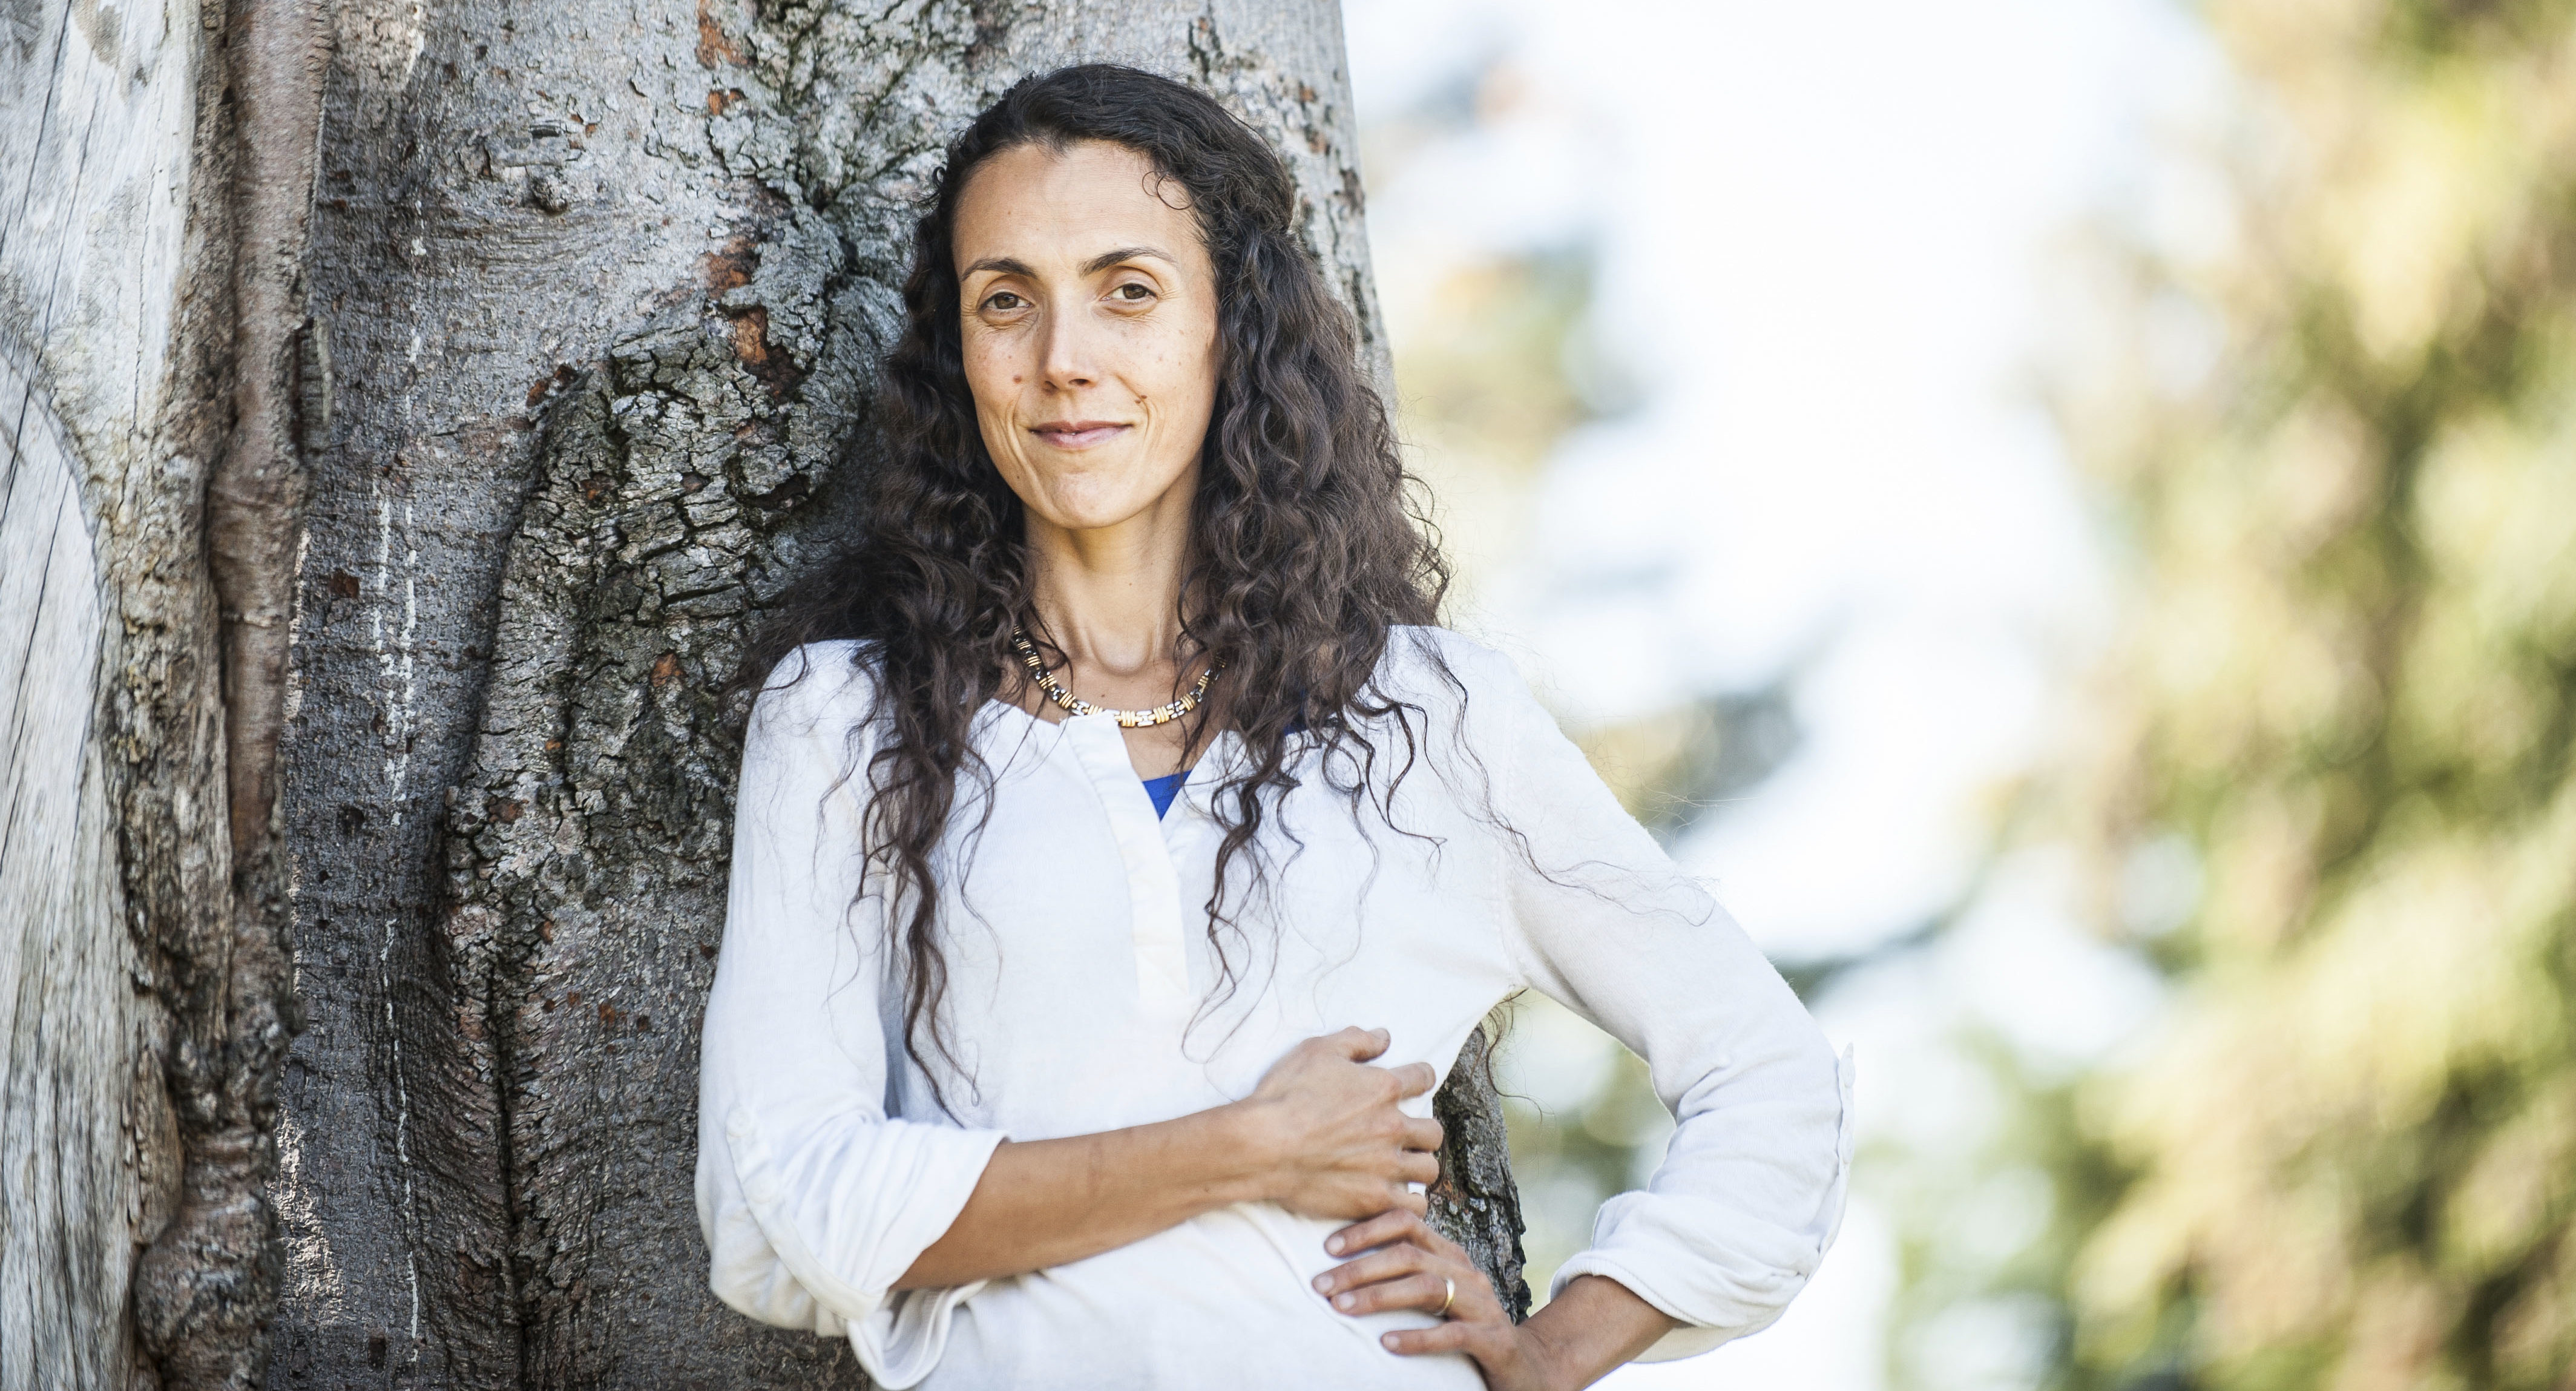 Chaya-Ryvka Diehl's new paleo vegan line is Living Vision Kitchen